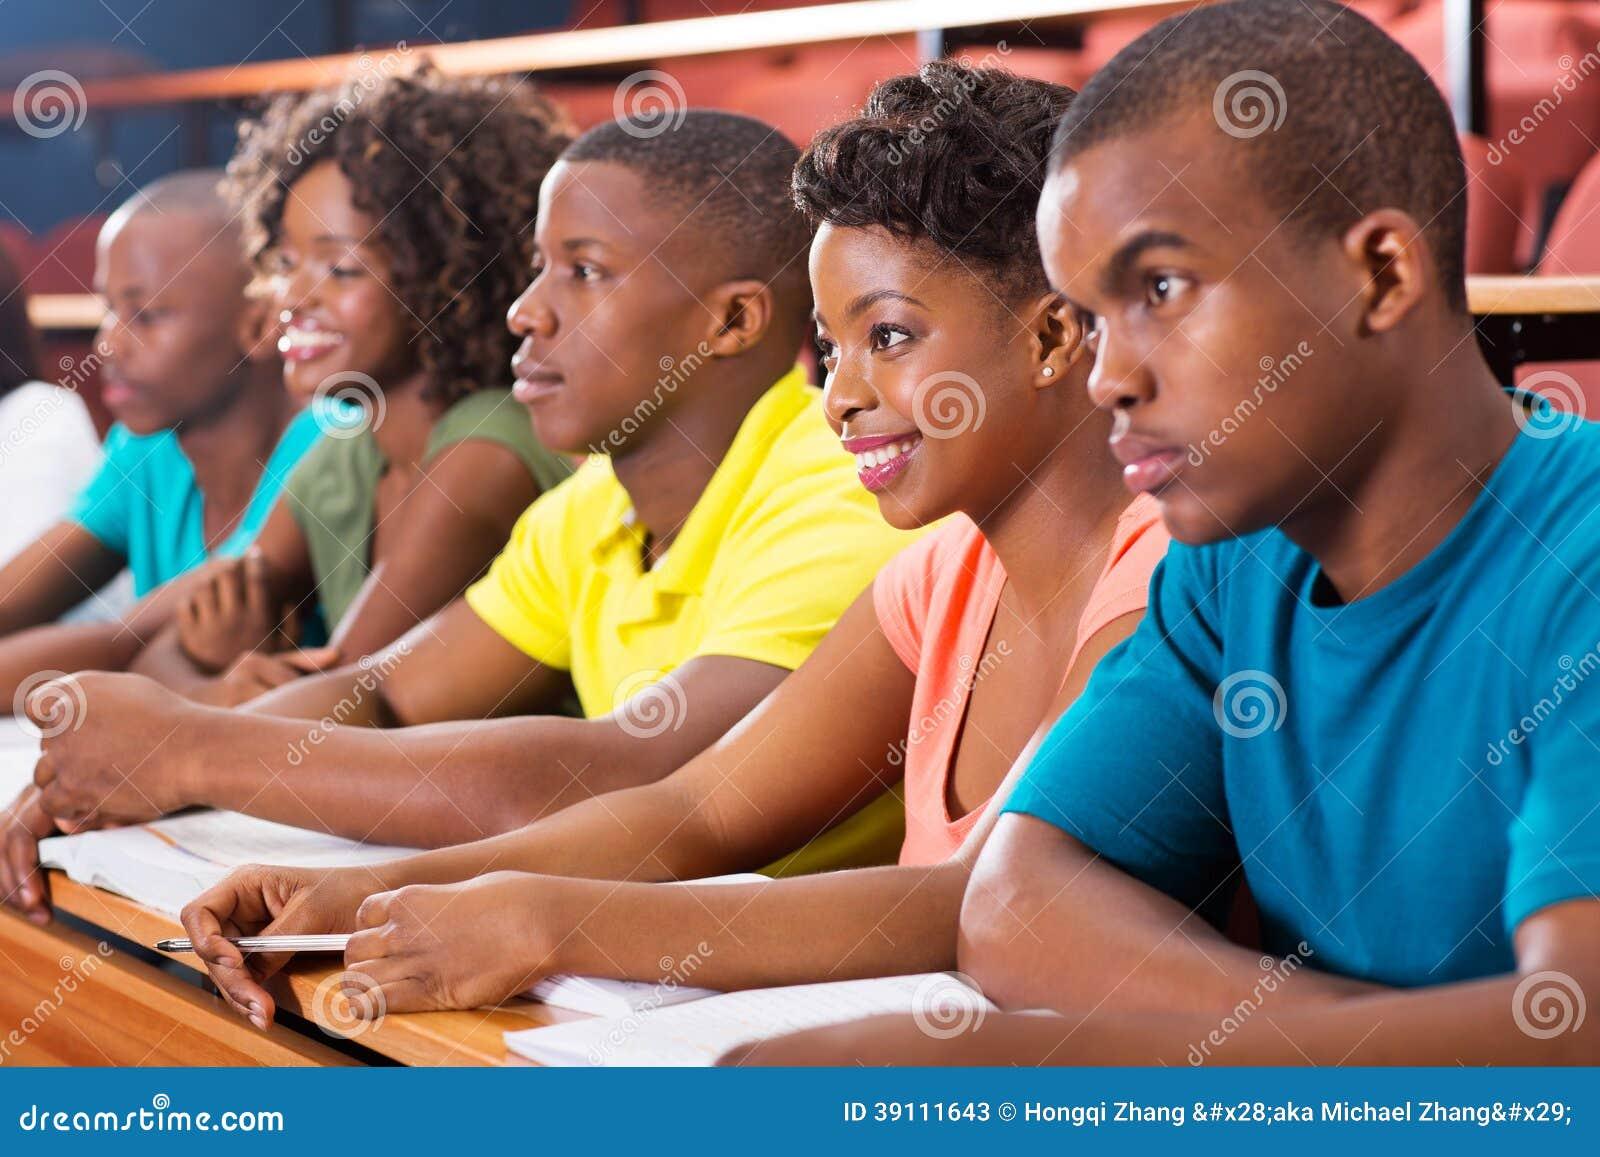 African university students amateur lesbian sextape 6